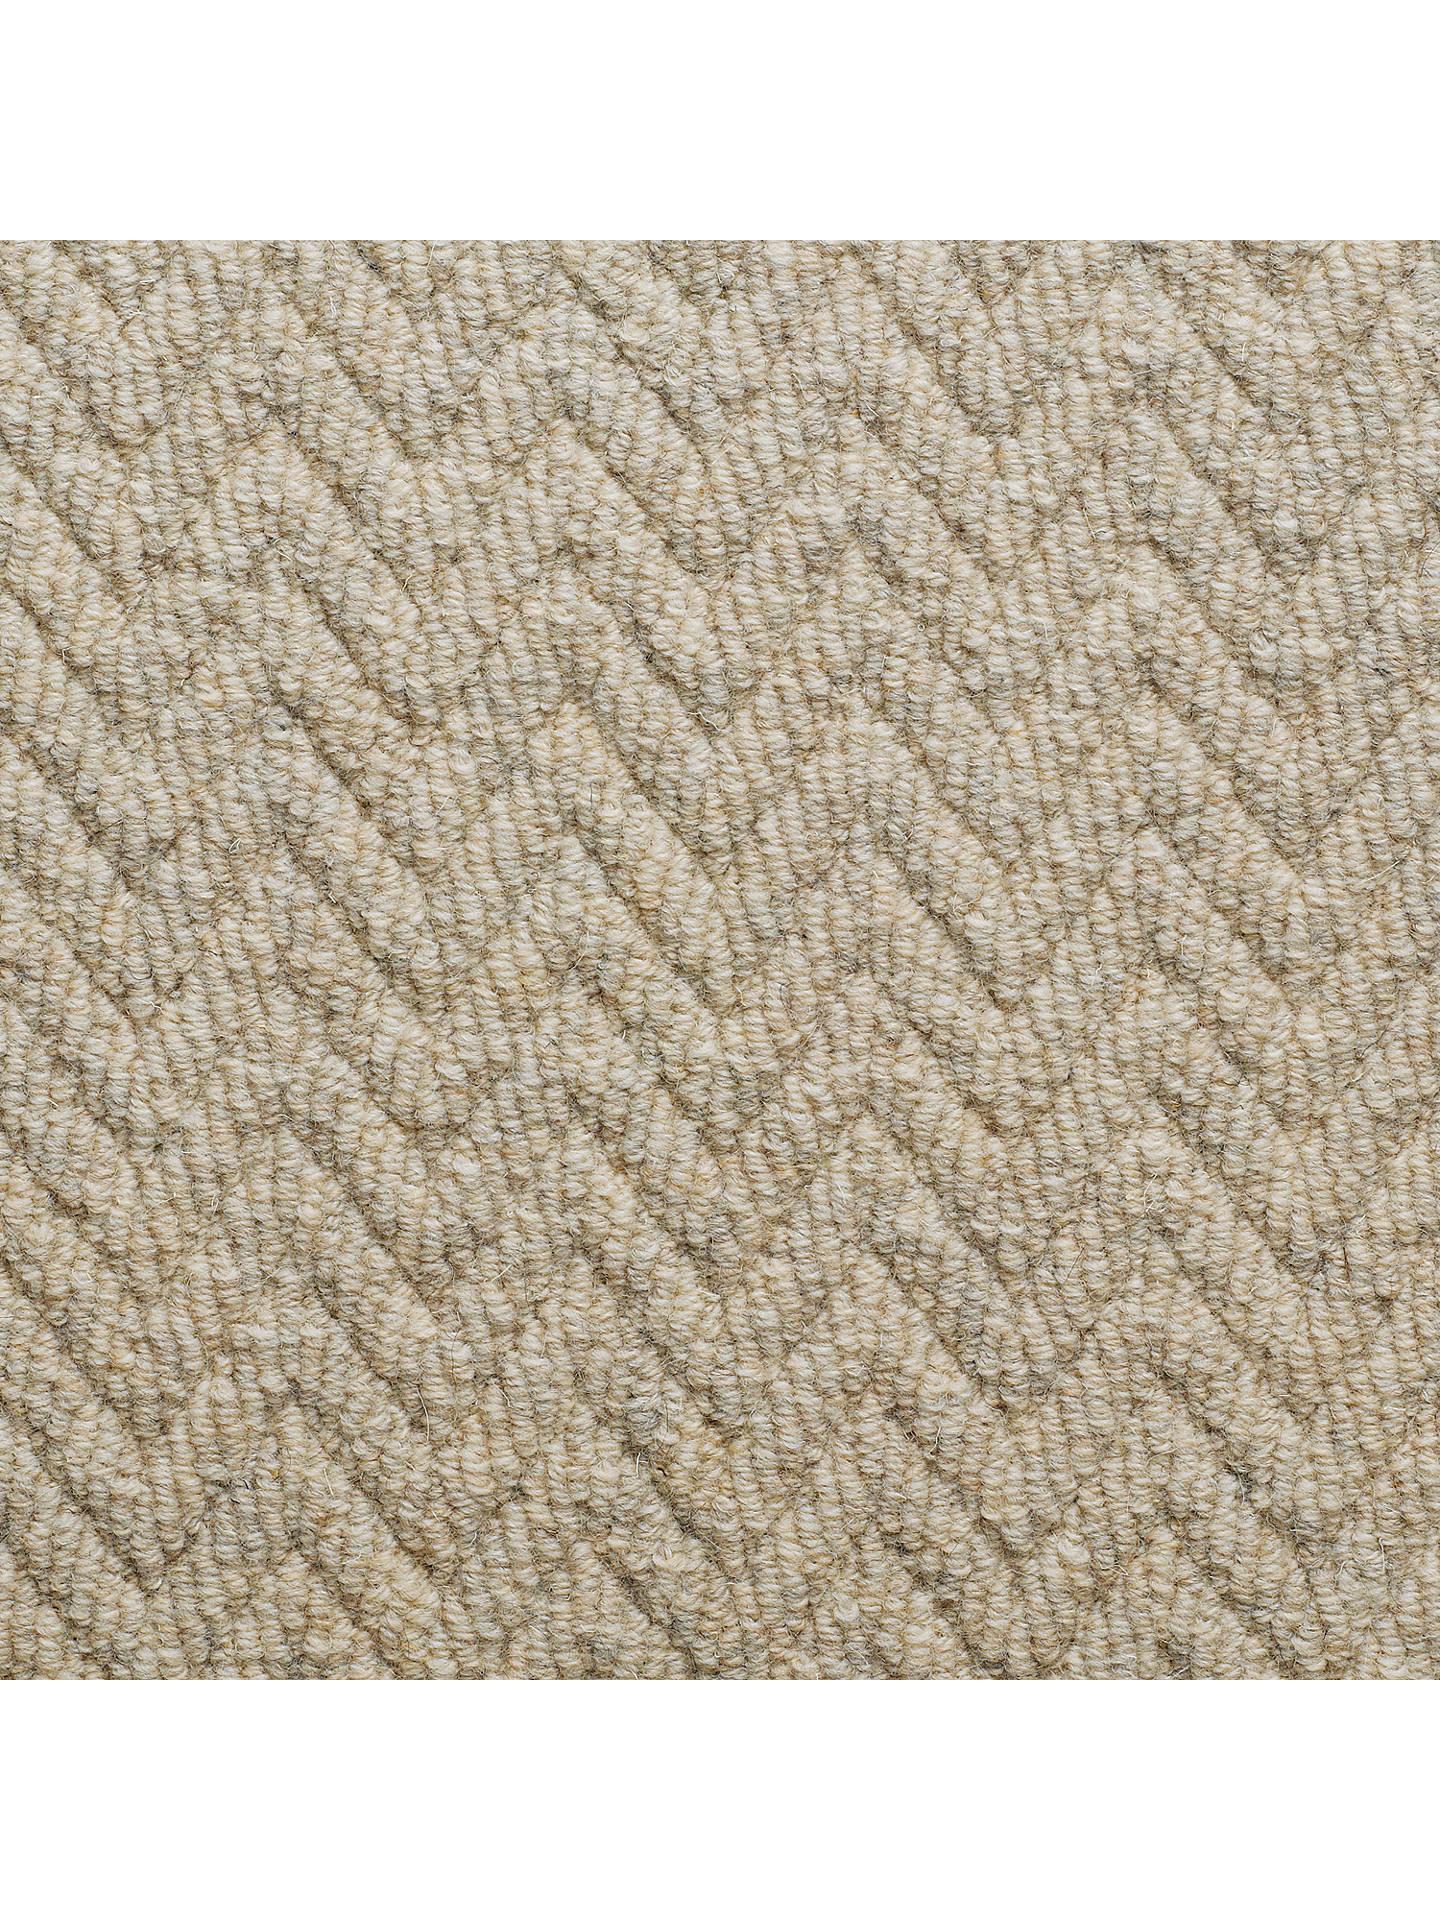 john lewis herringbone loop carpet at john lewis partners. Black Bedroom Furniture Sets. Home Design Ideas